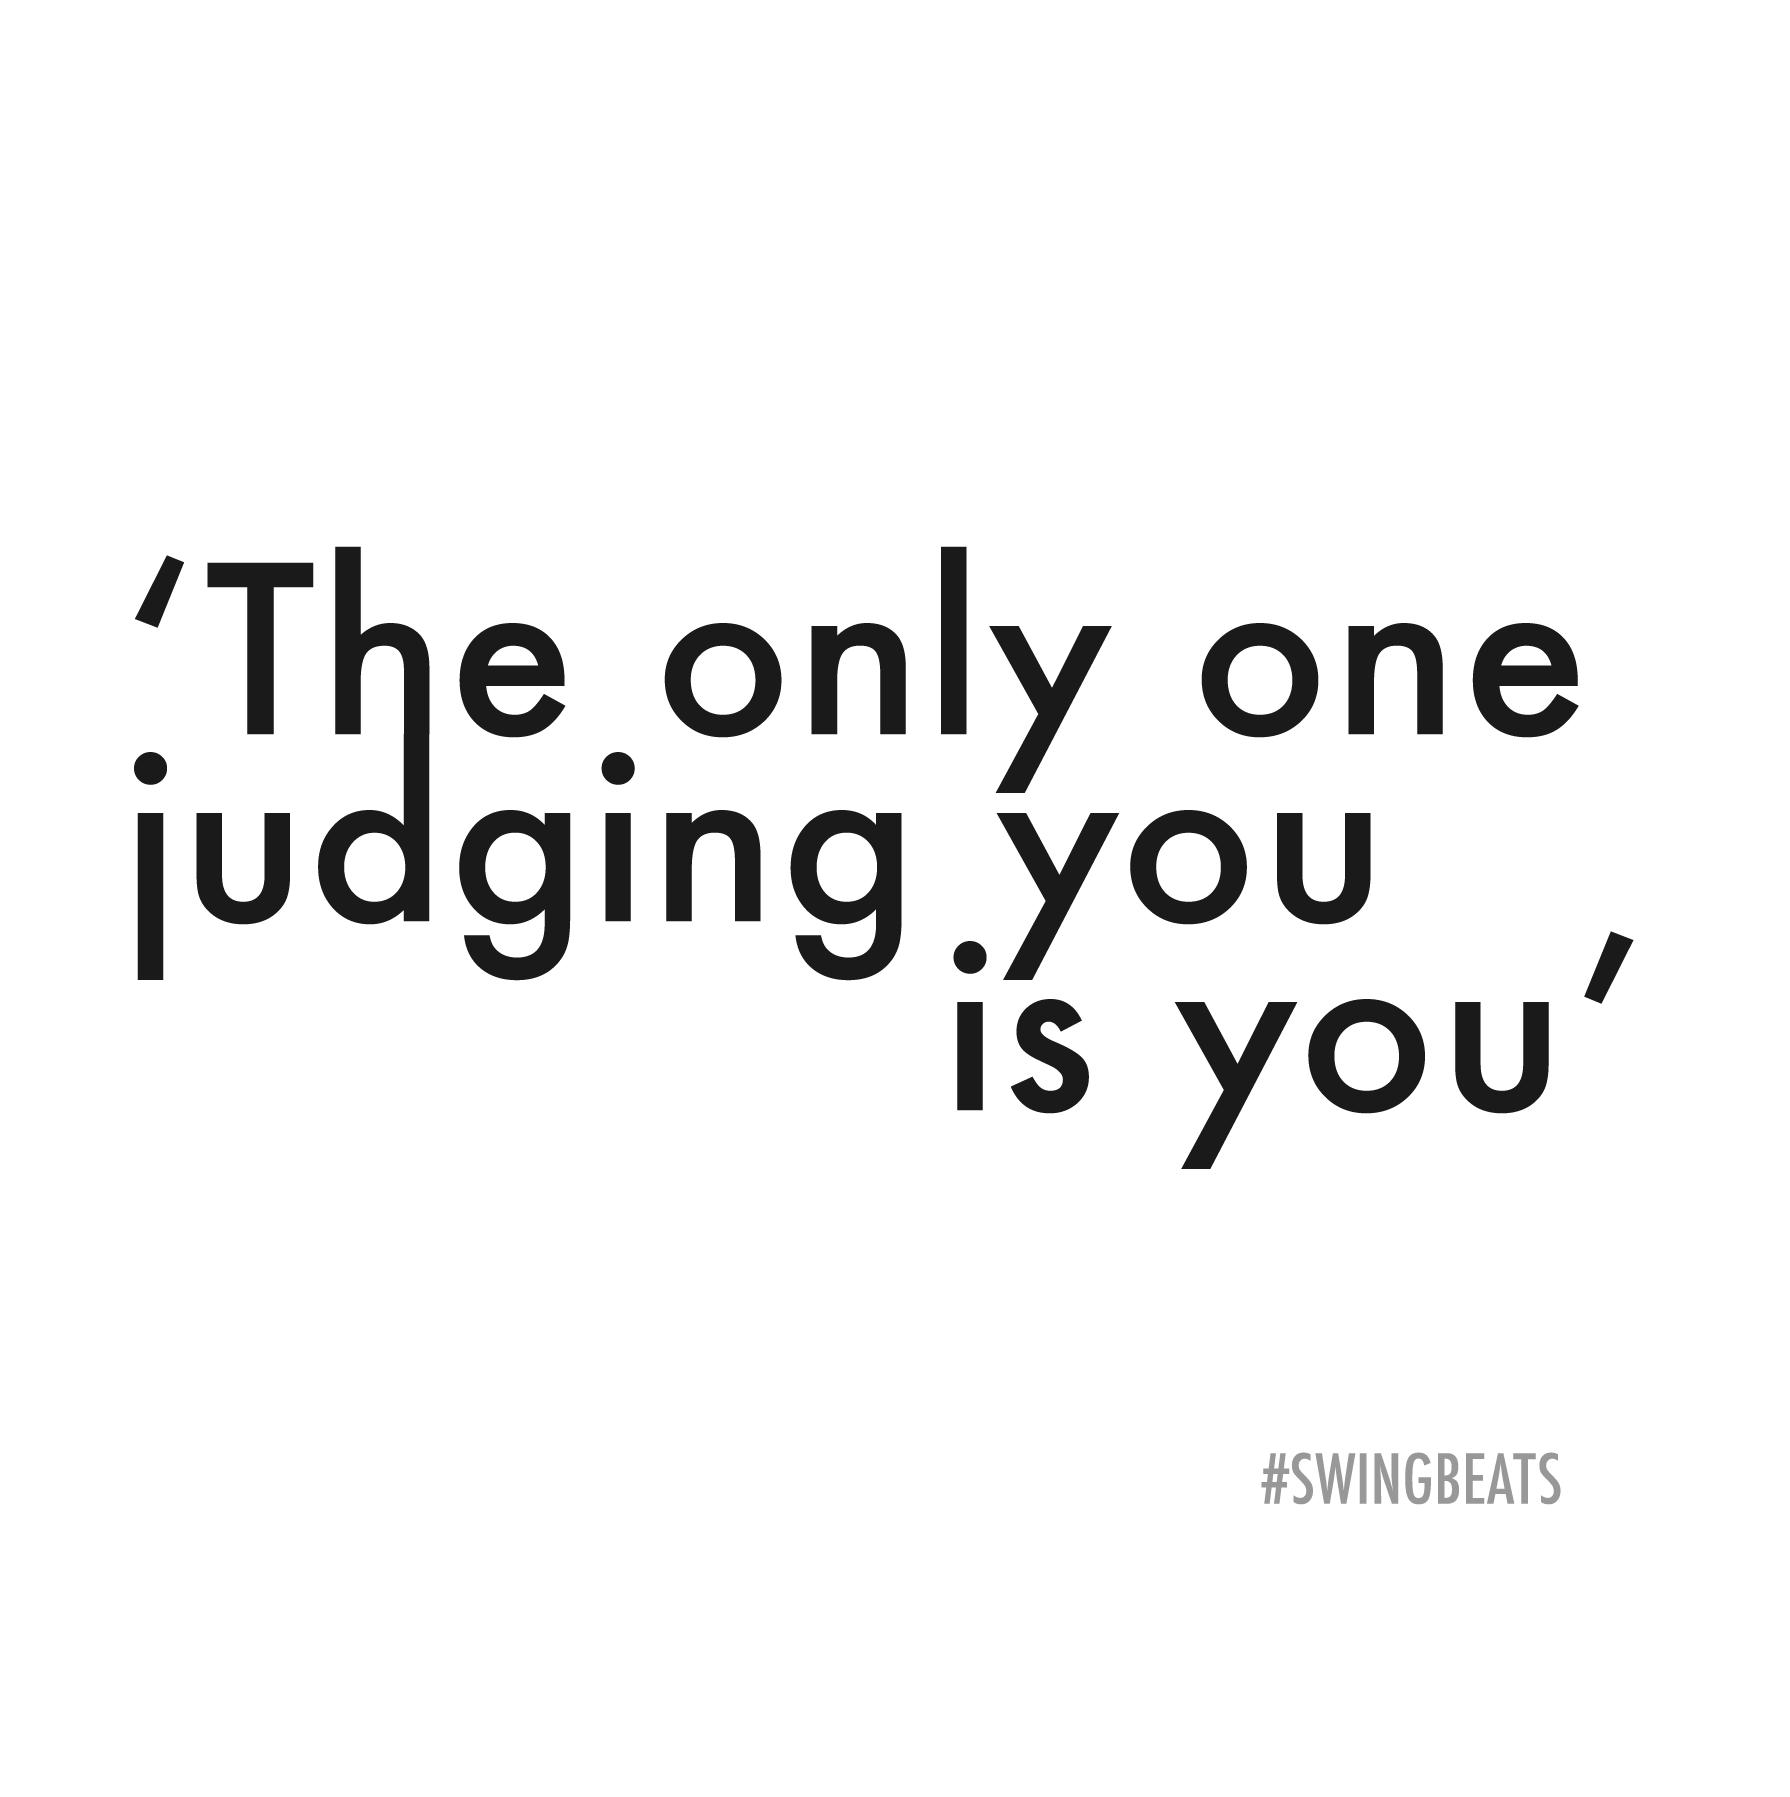 Judging you is U